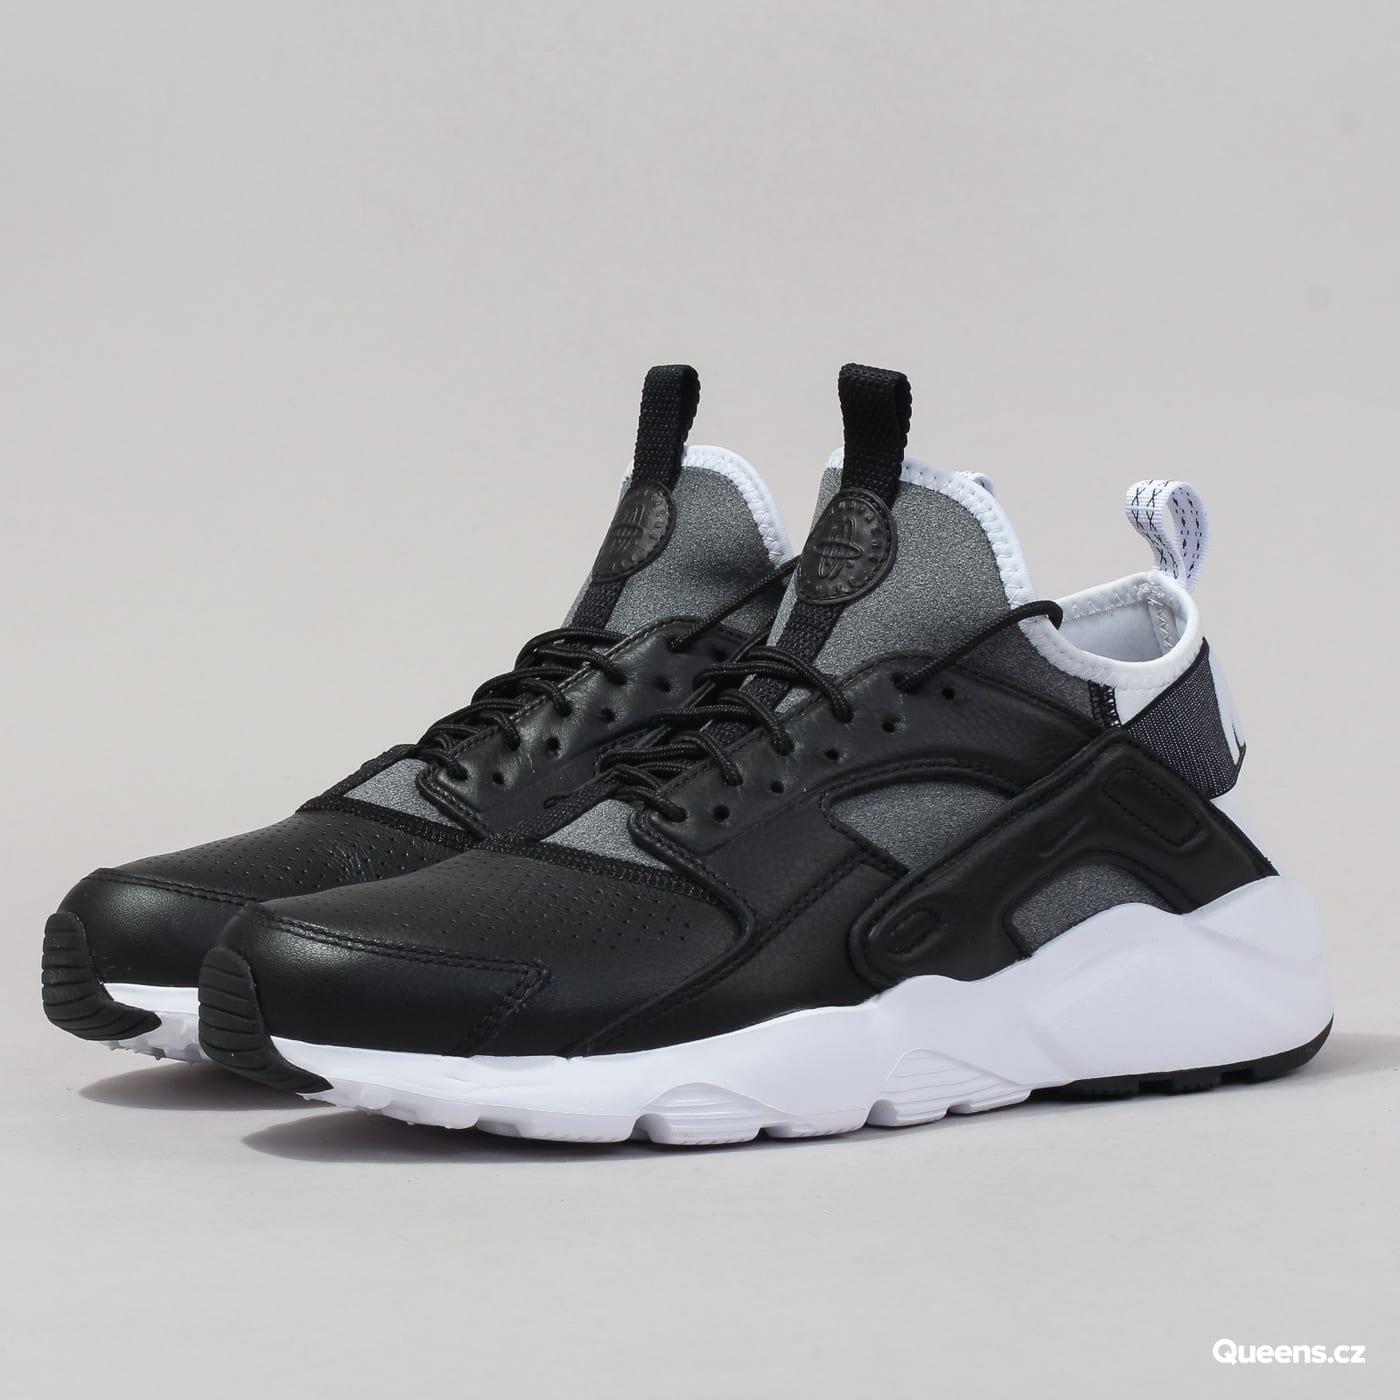 Nike Air Huarache Run Ultra SE black / black - white